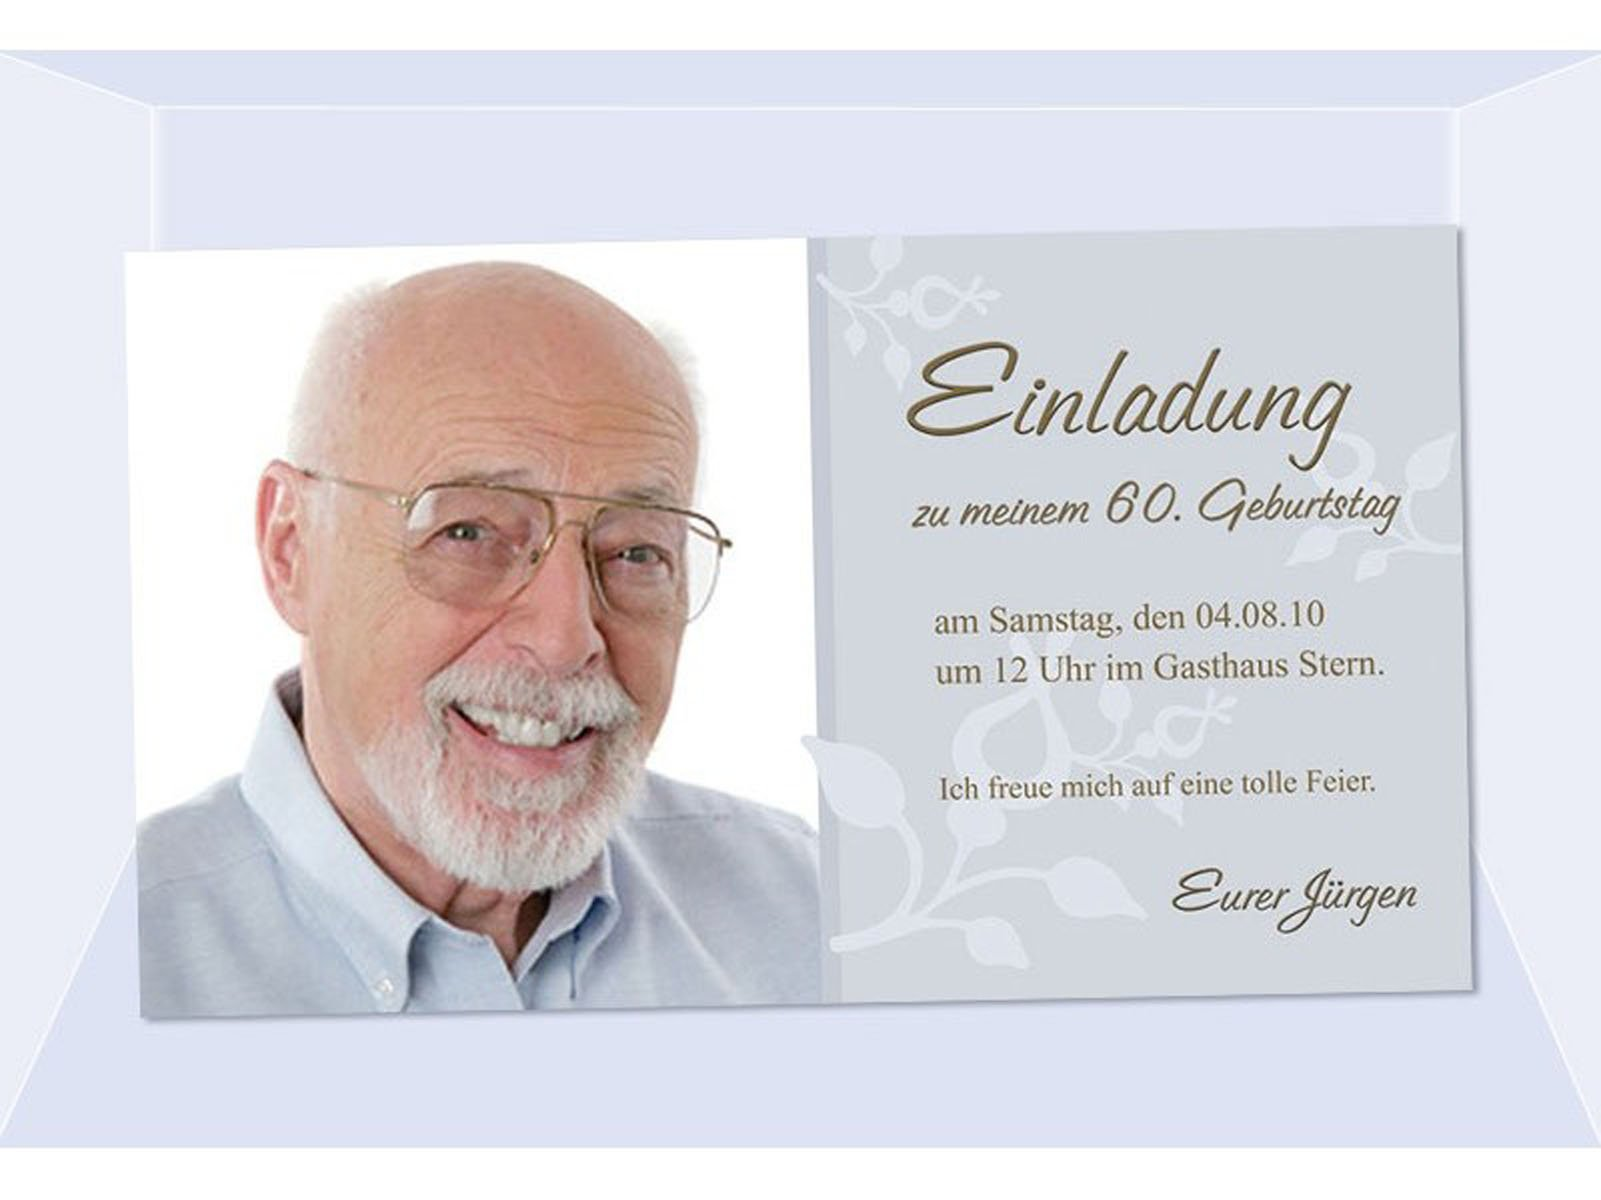 Einladung Zum 60 Geburtstag : Einladung Zum 60 Geburtstag Vorlagen,  Einladung. Einladungen Drucken Kostenlos ...